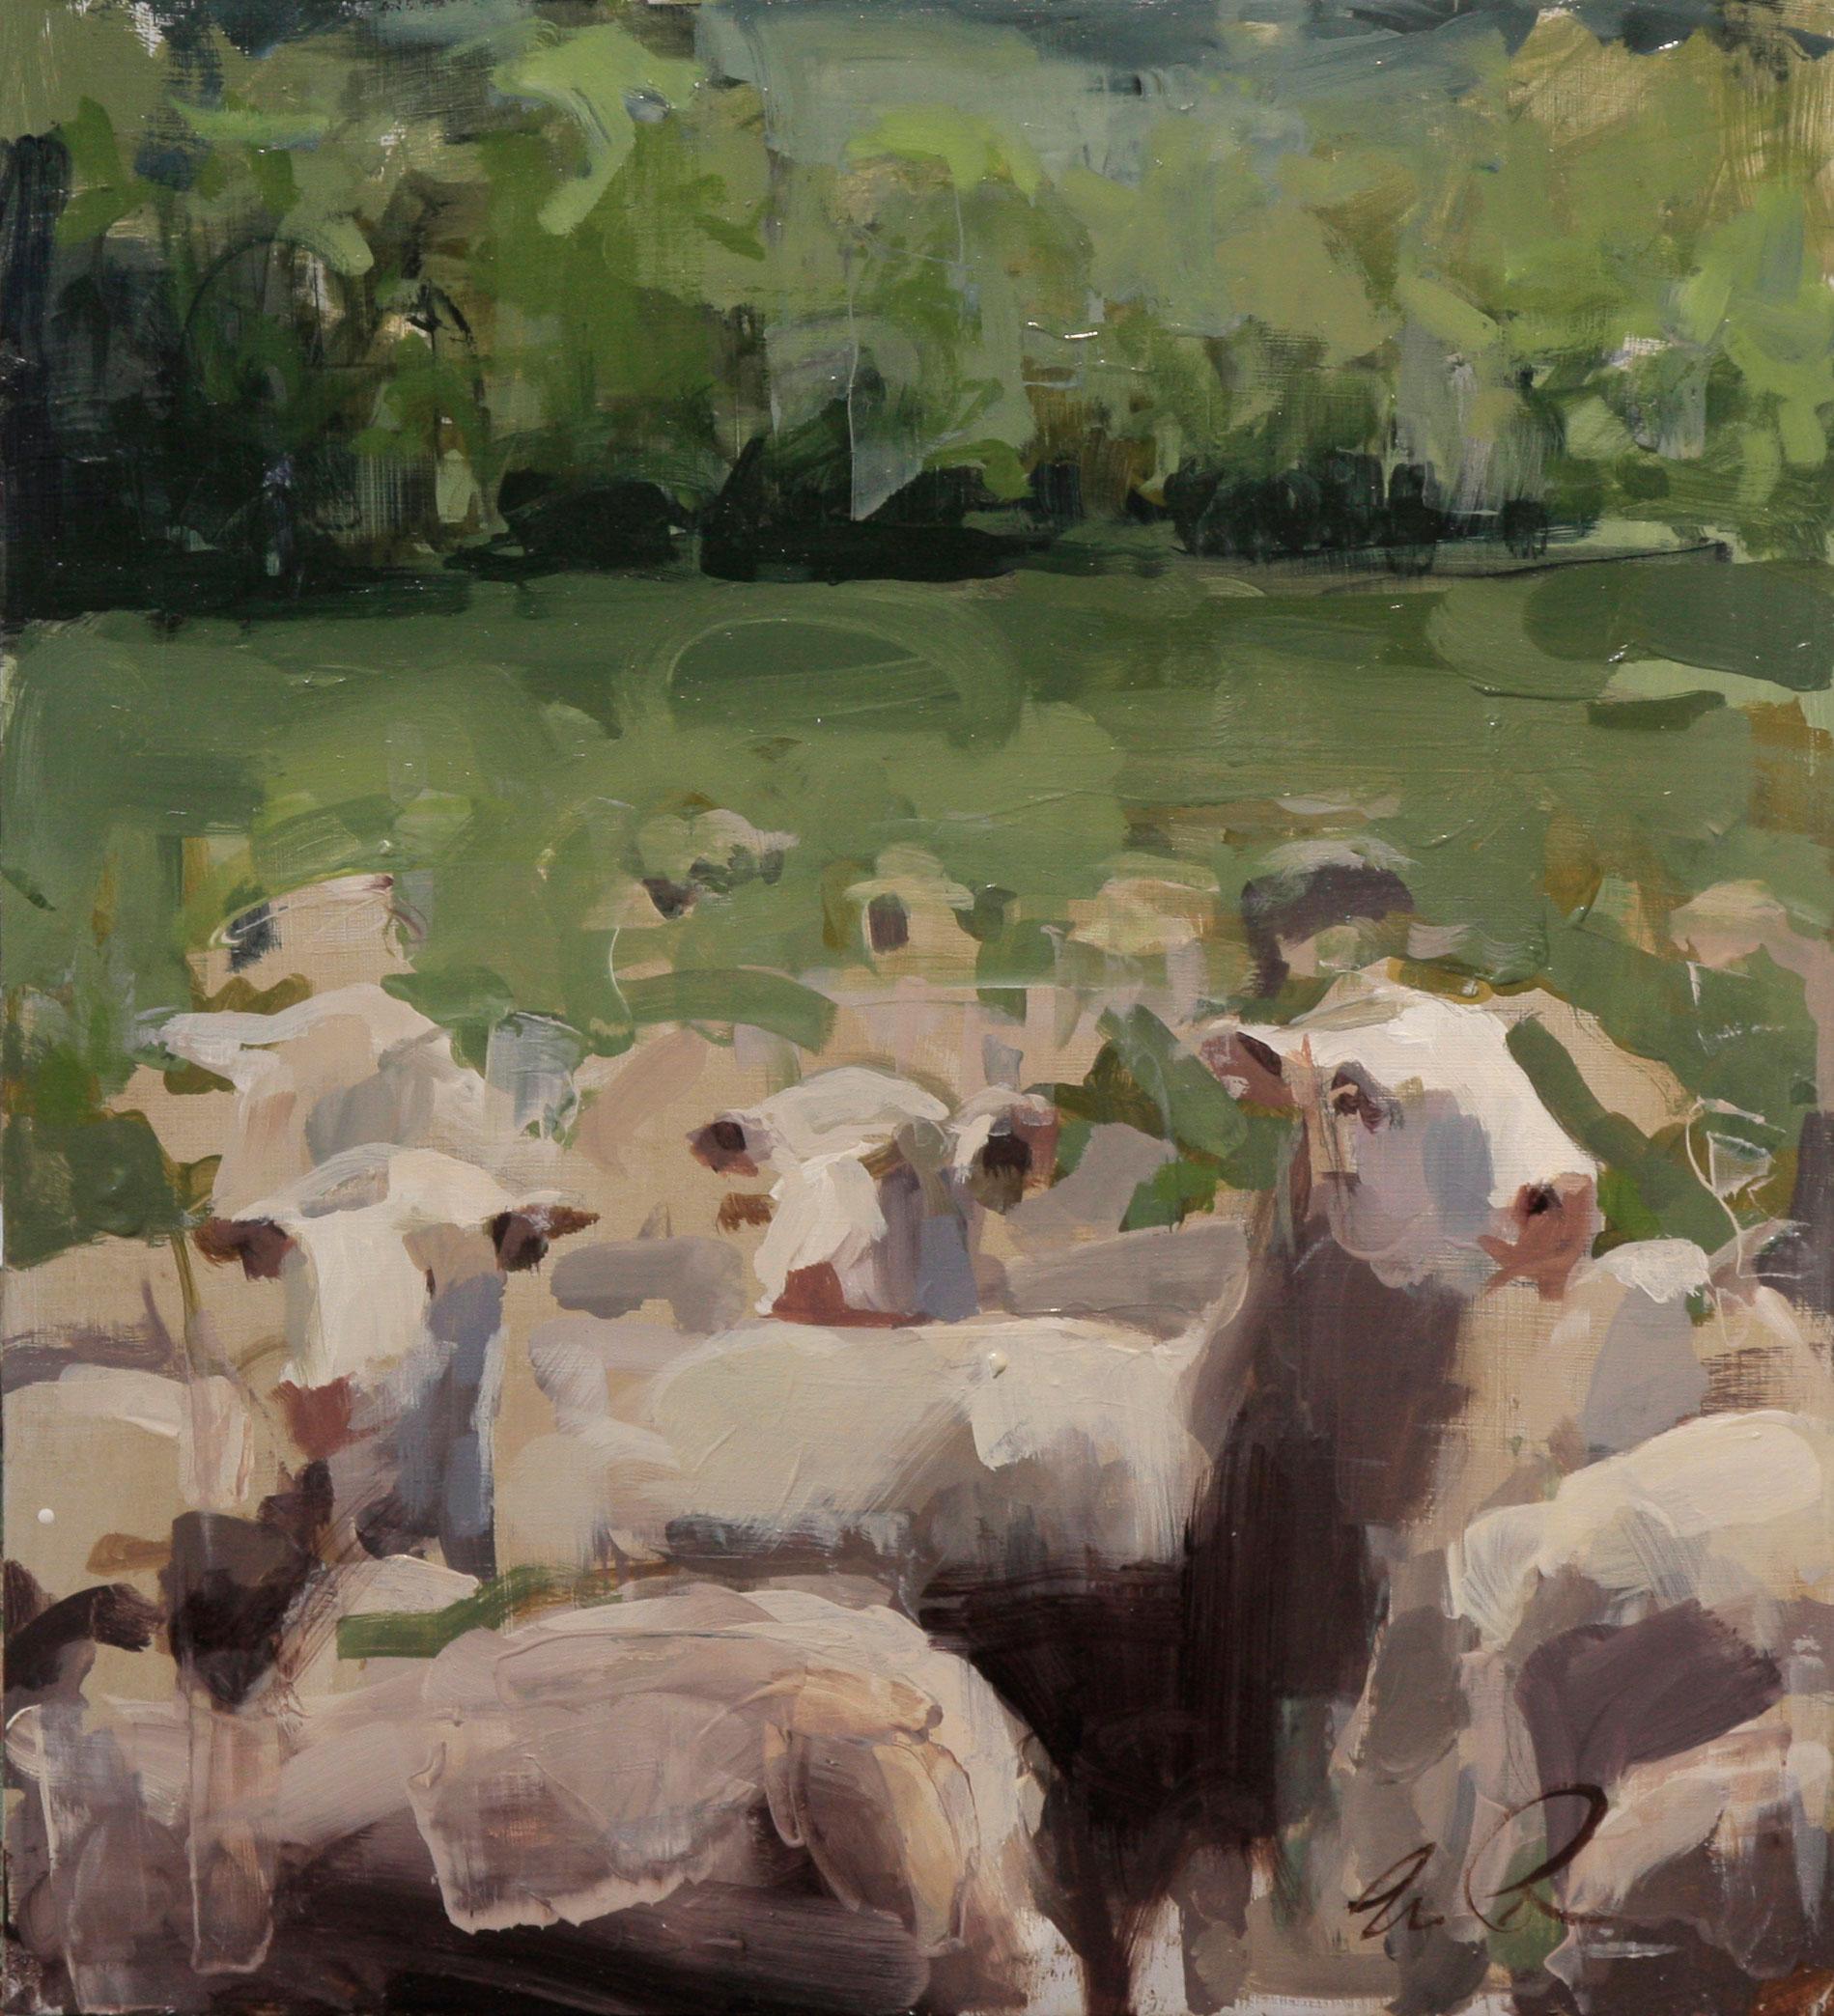 mark-crenshaw-1307-sheep-plate.jpg